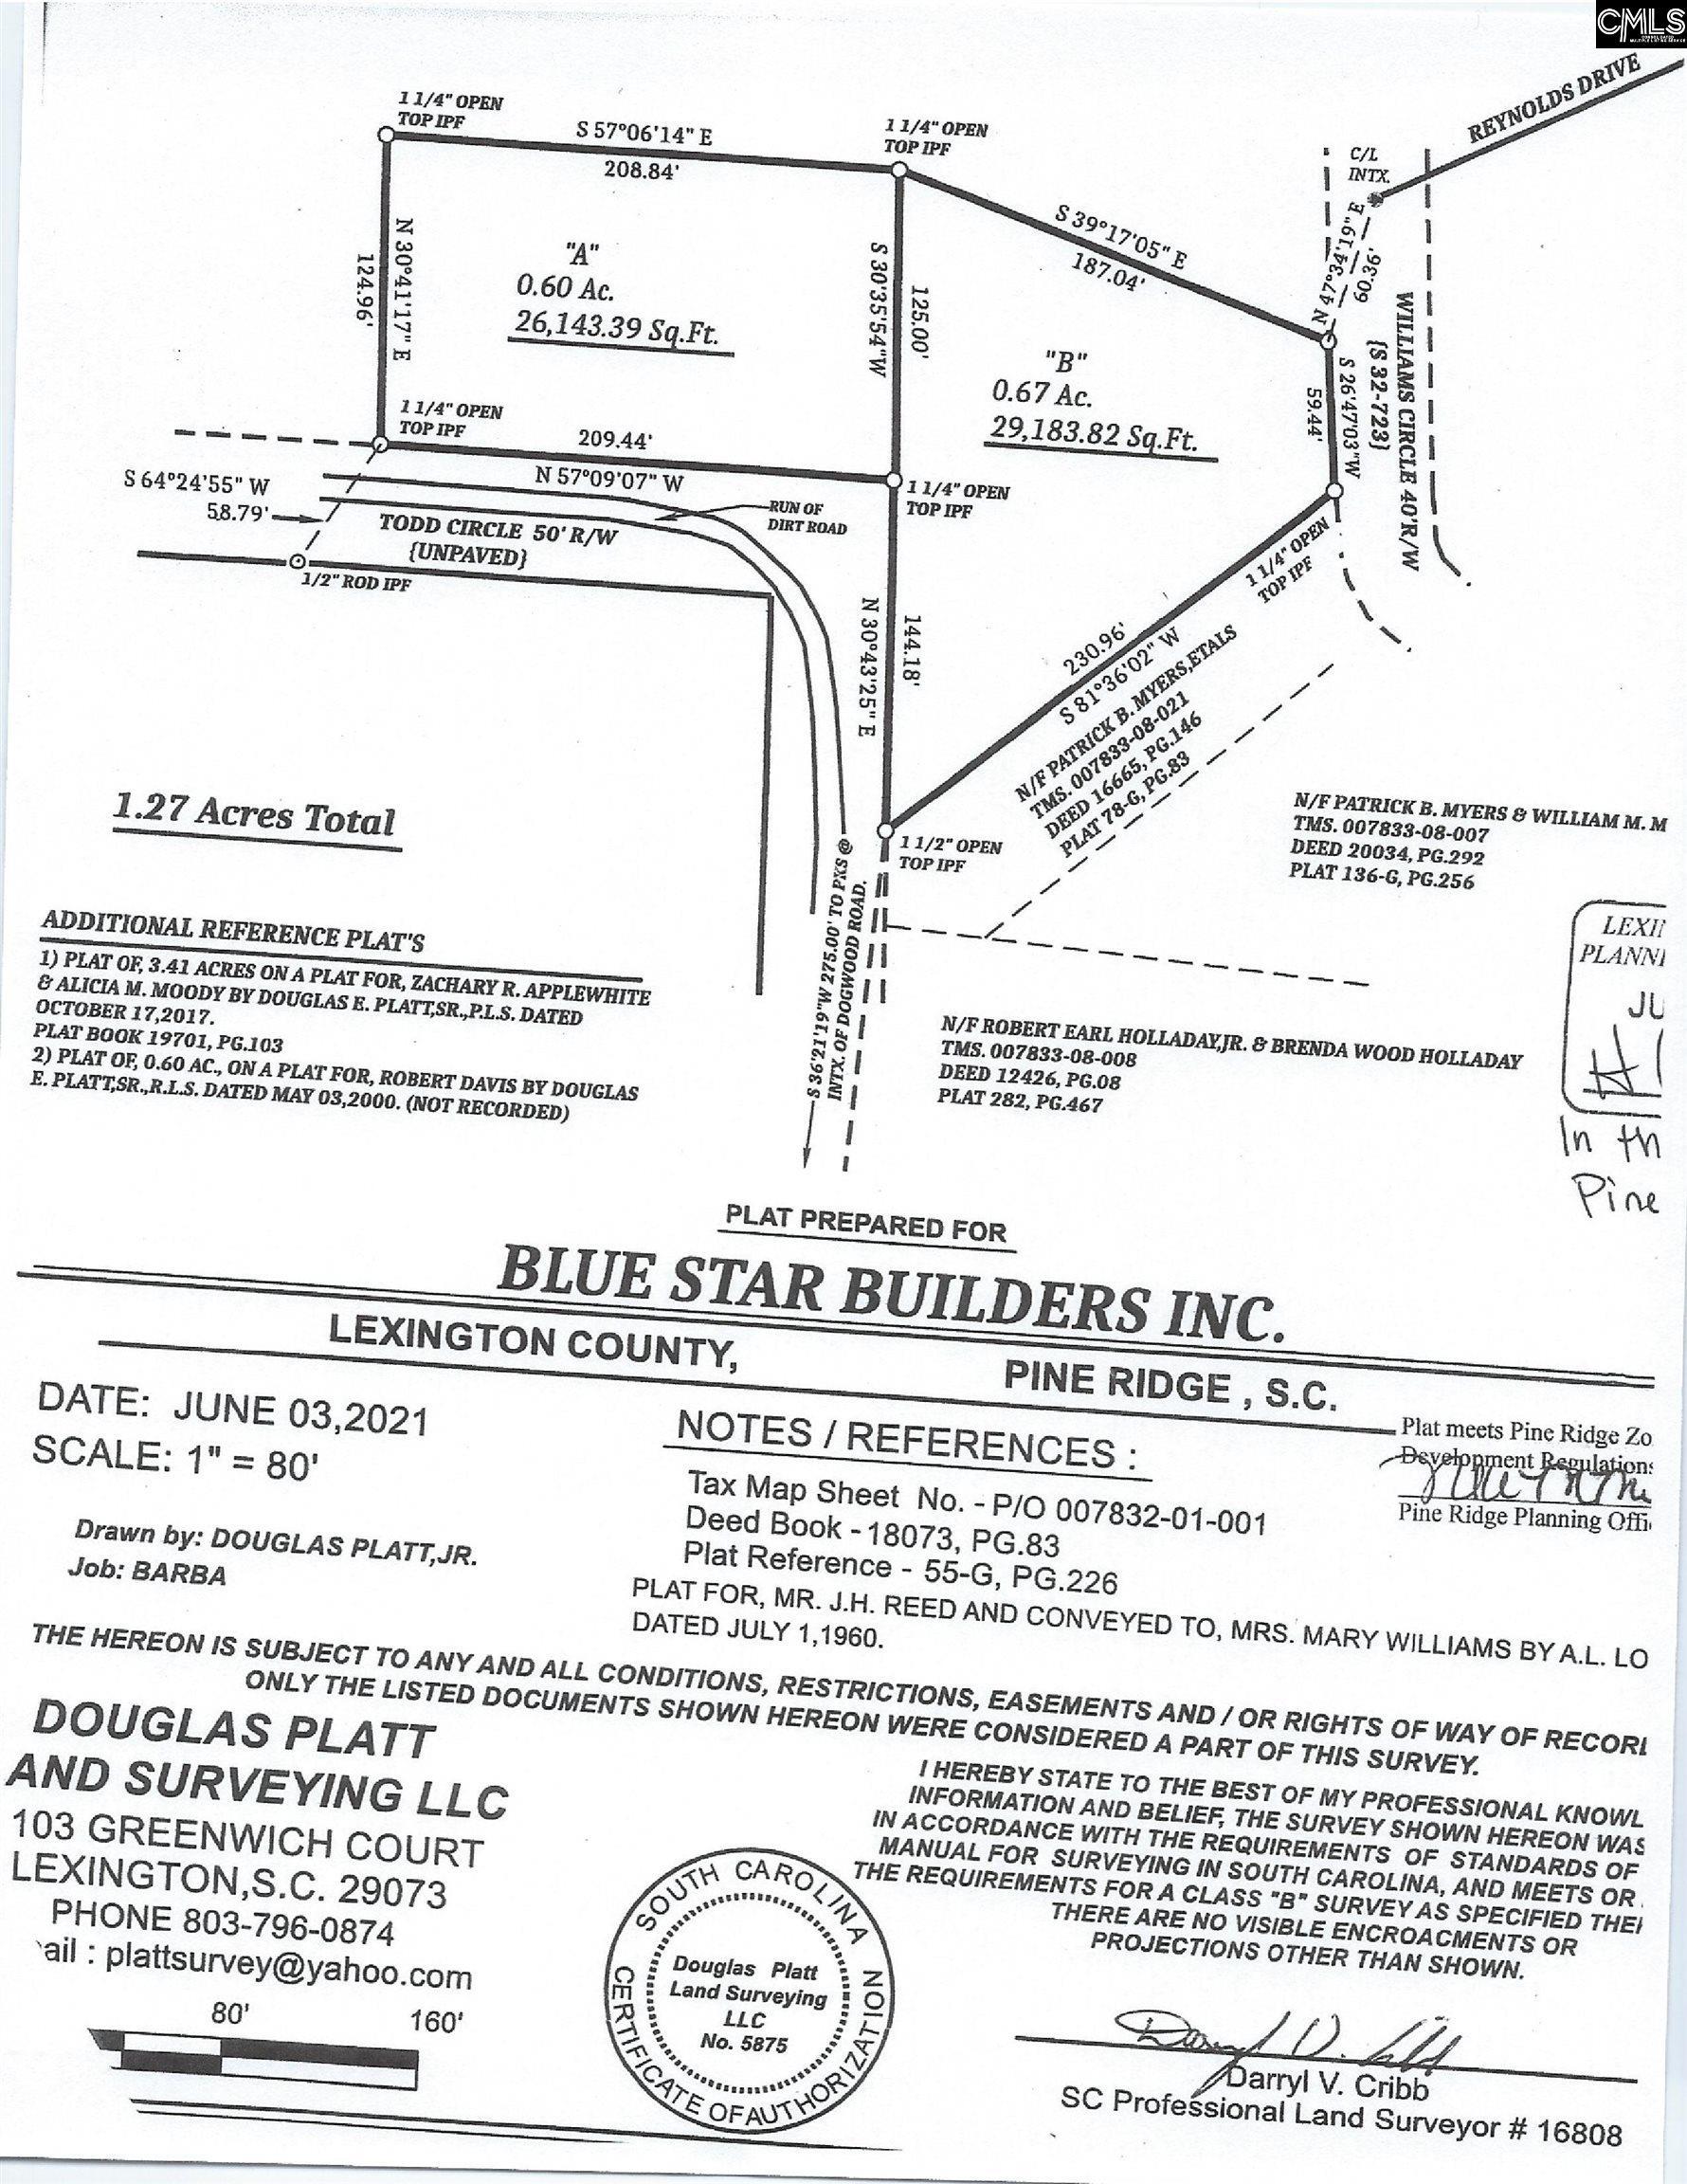 207 Todd Circle UNIT B West Columbia, SC 29172